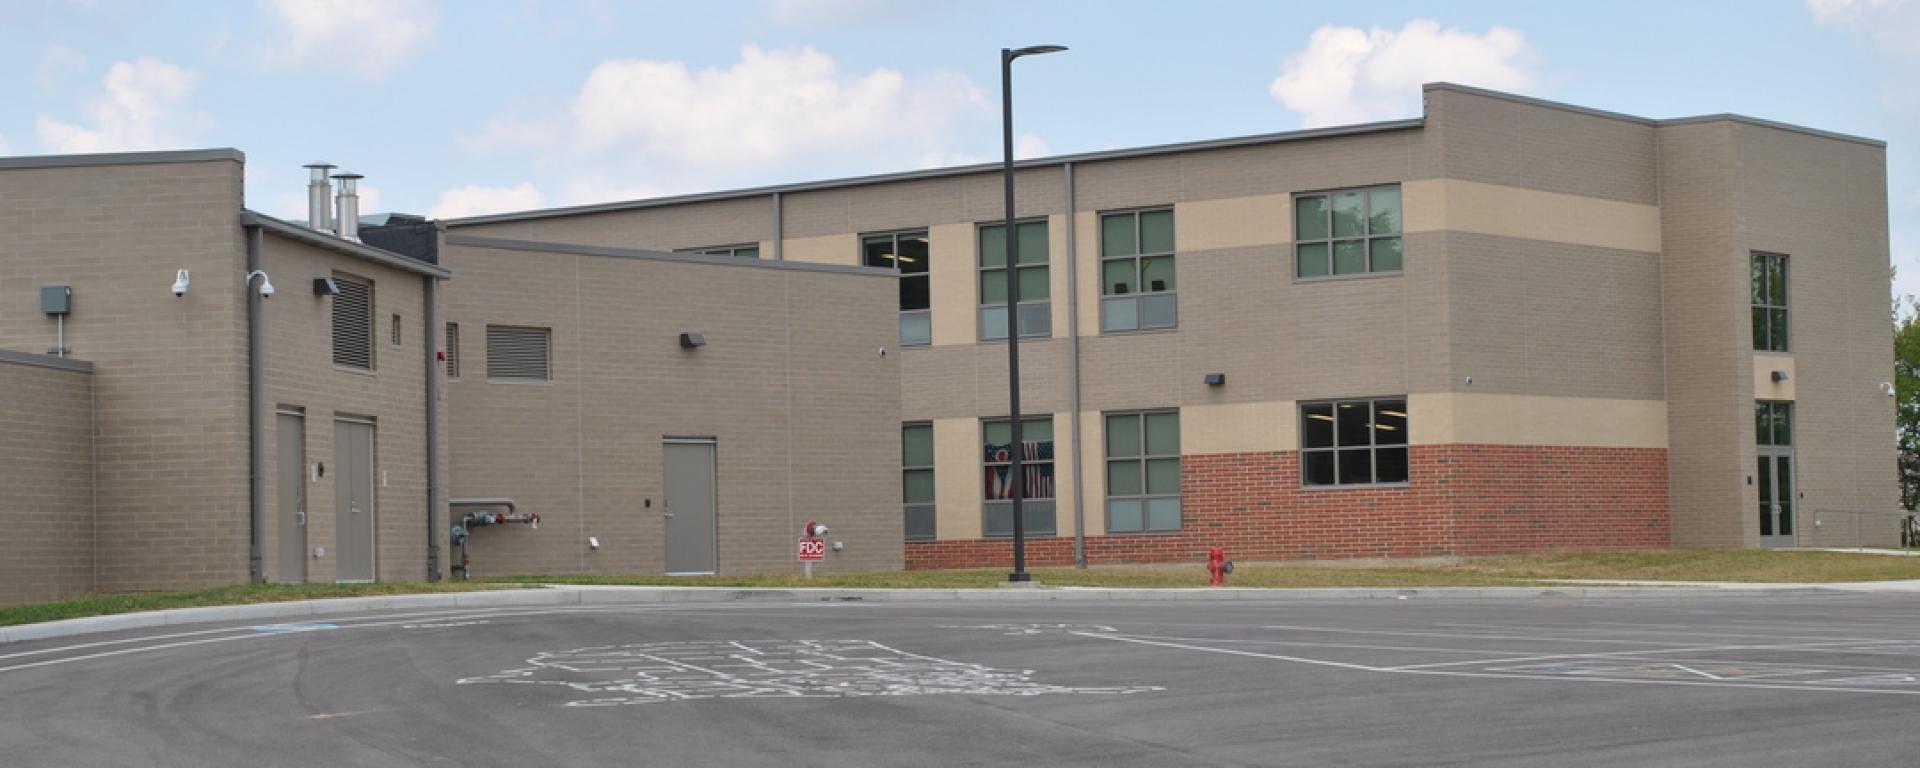 Side view of Kramer Elementary